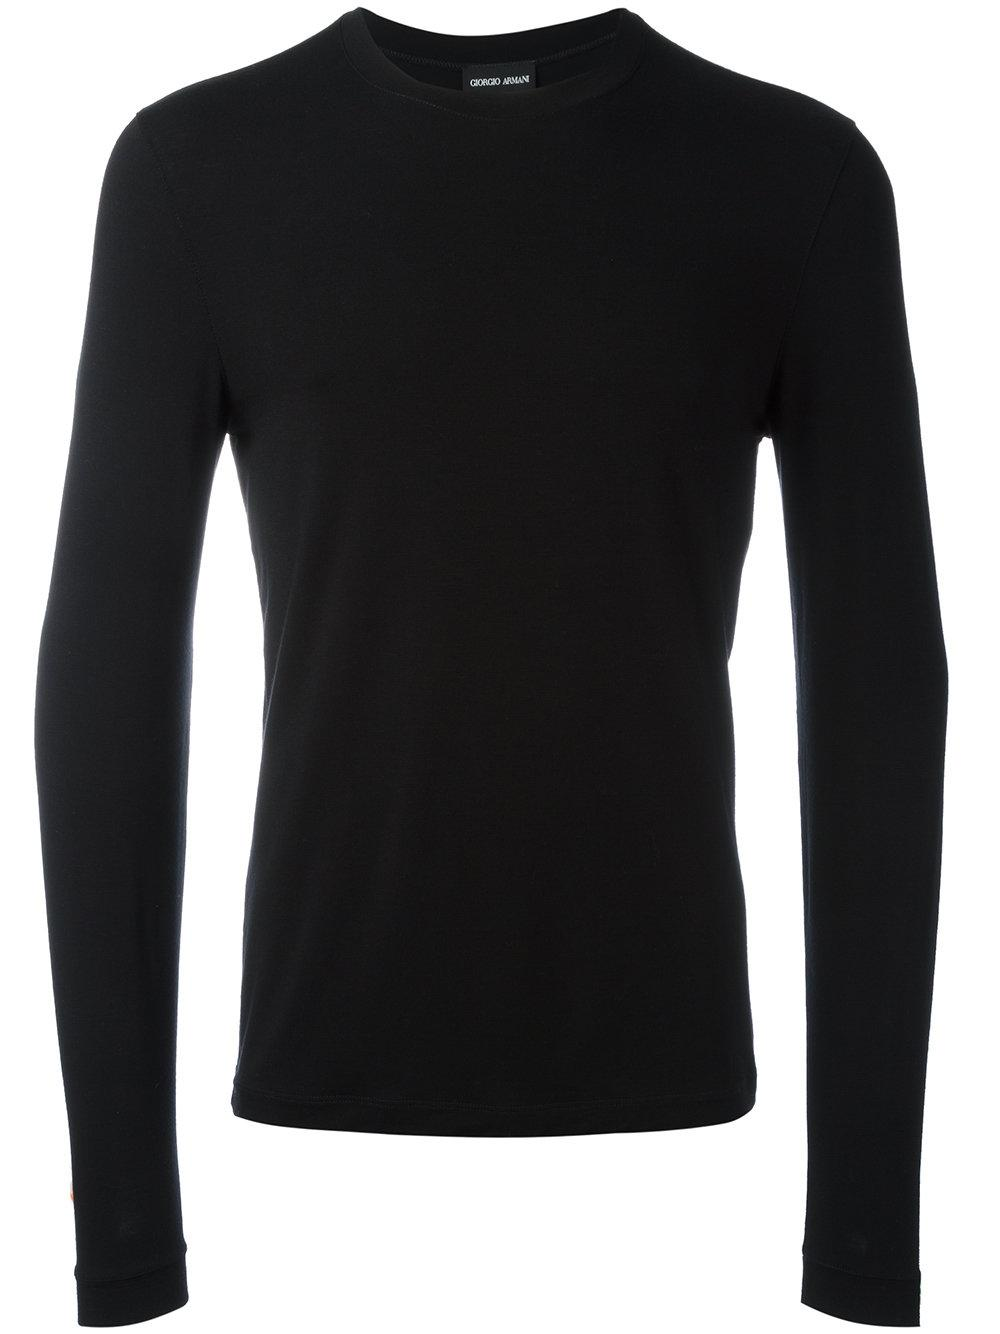 Giorgio Armani Long Sleeve T Shirt In Black For Men Lyst